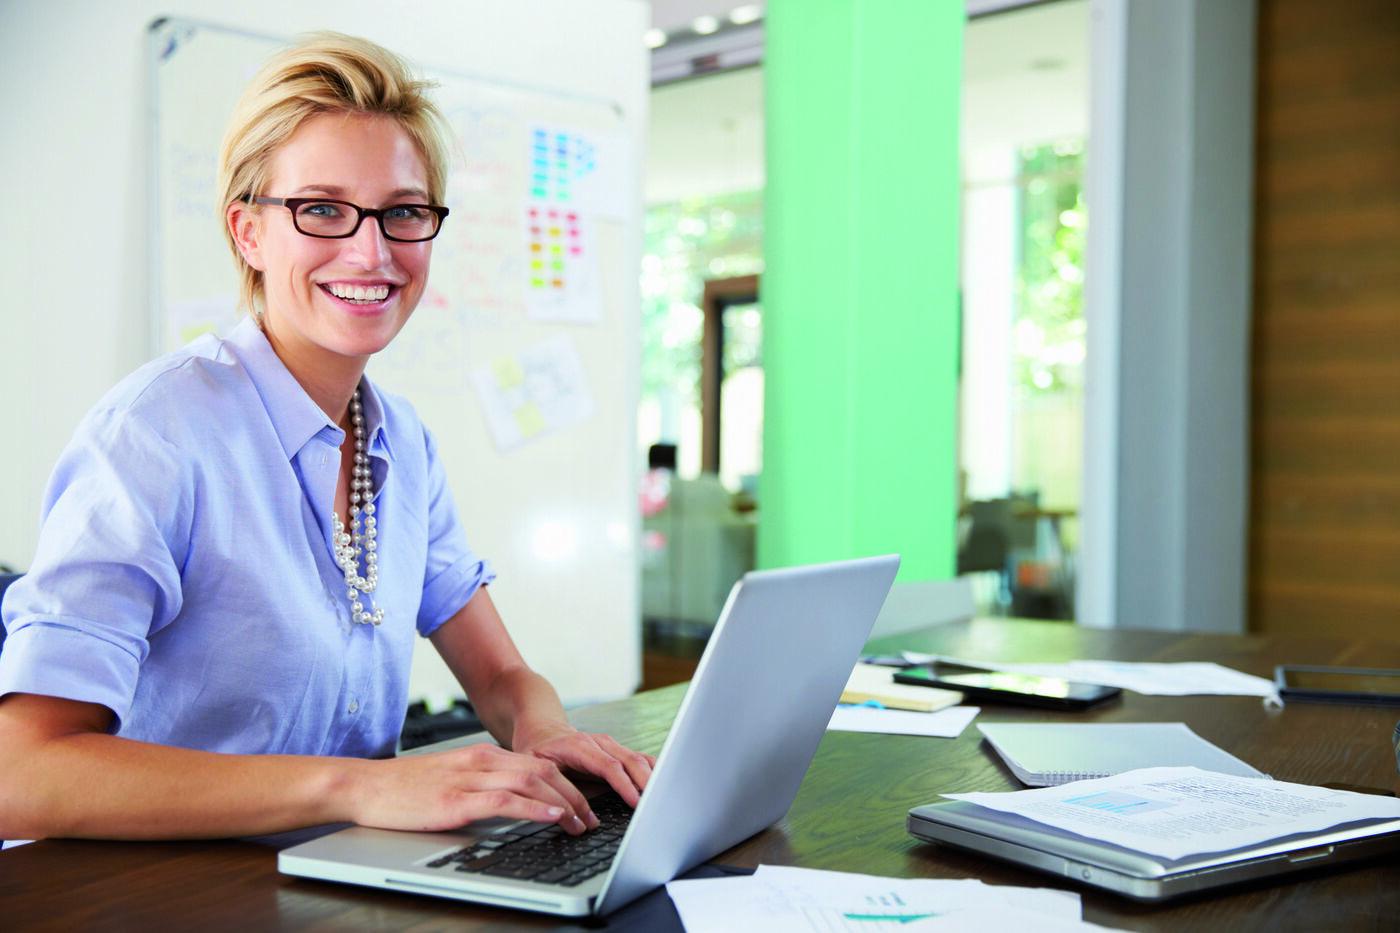 Key Account Manager / Kundenberater (w/m/d) Gesundheitsprogramme und Tele-Medizin - Job München - Stellenportal SHL Familie